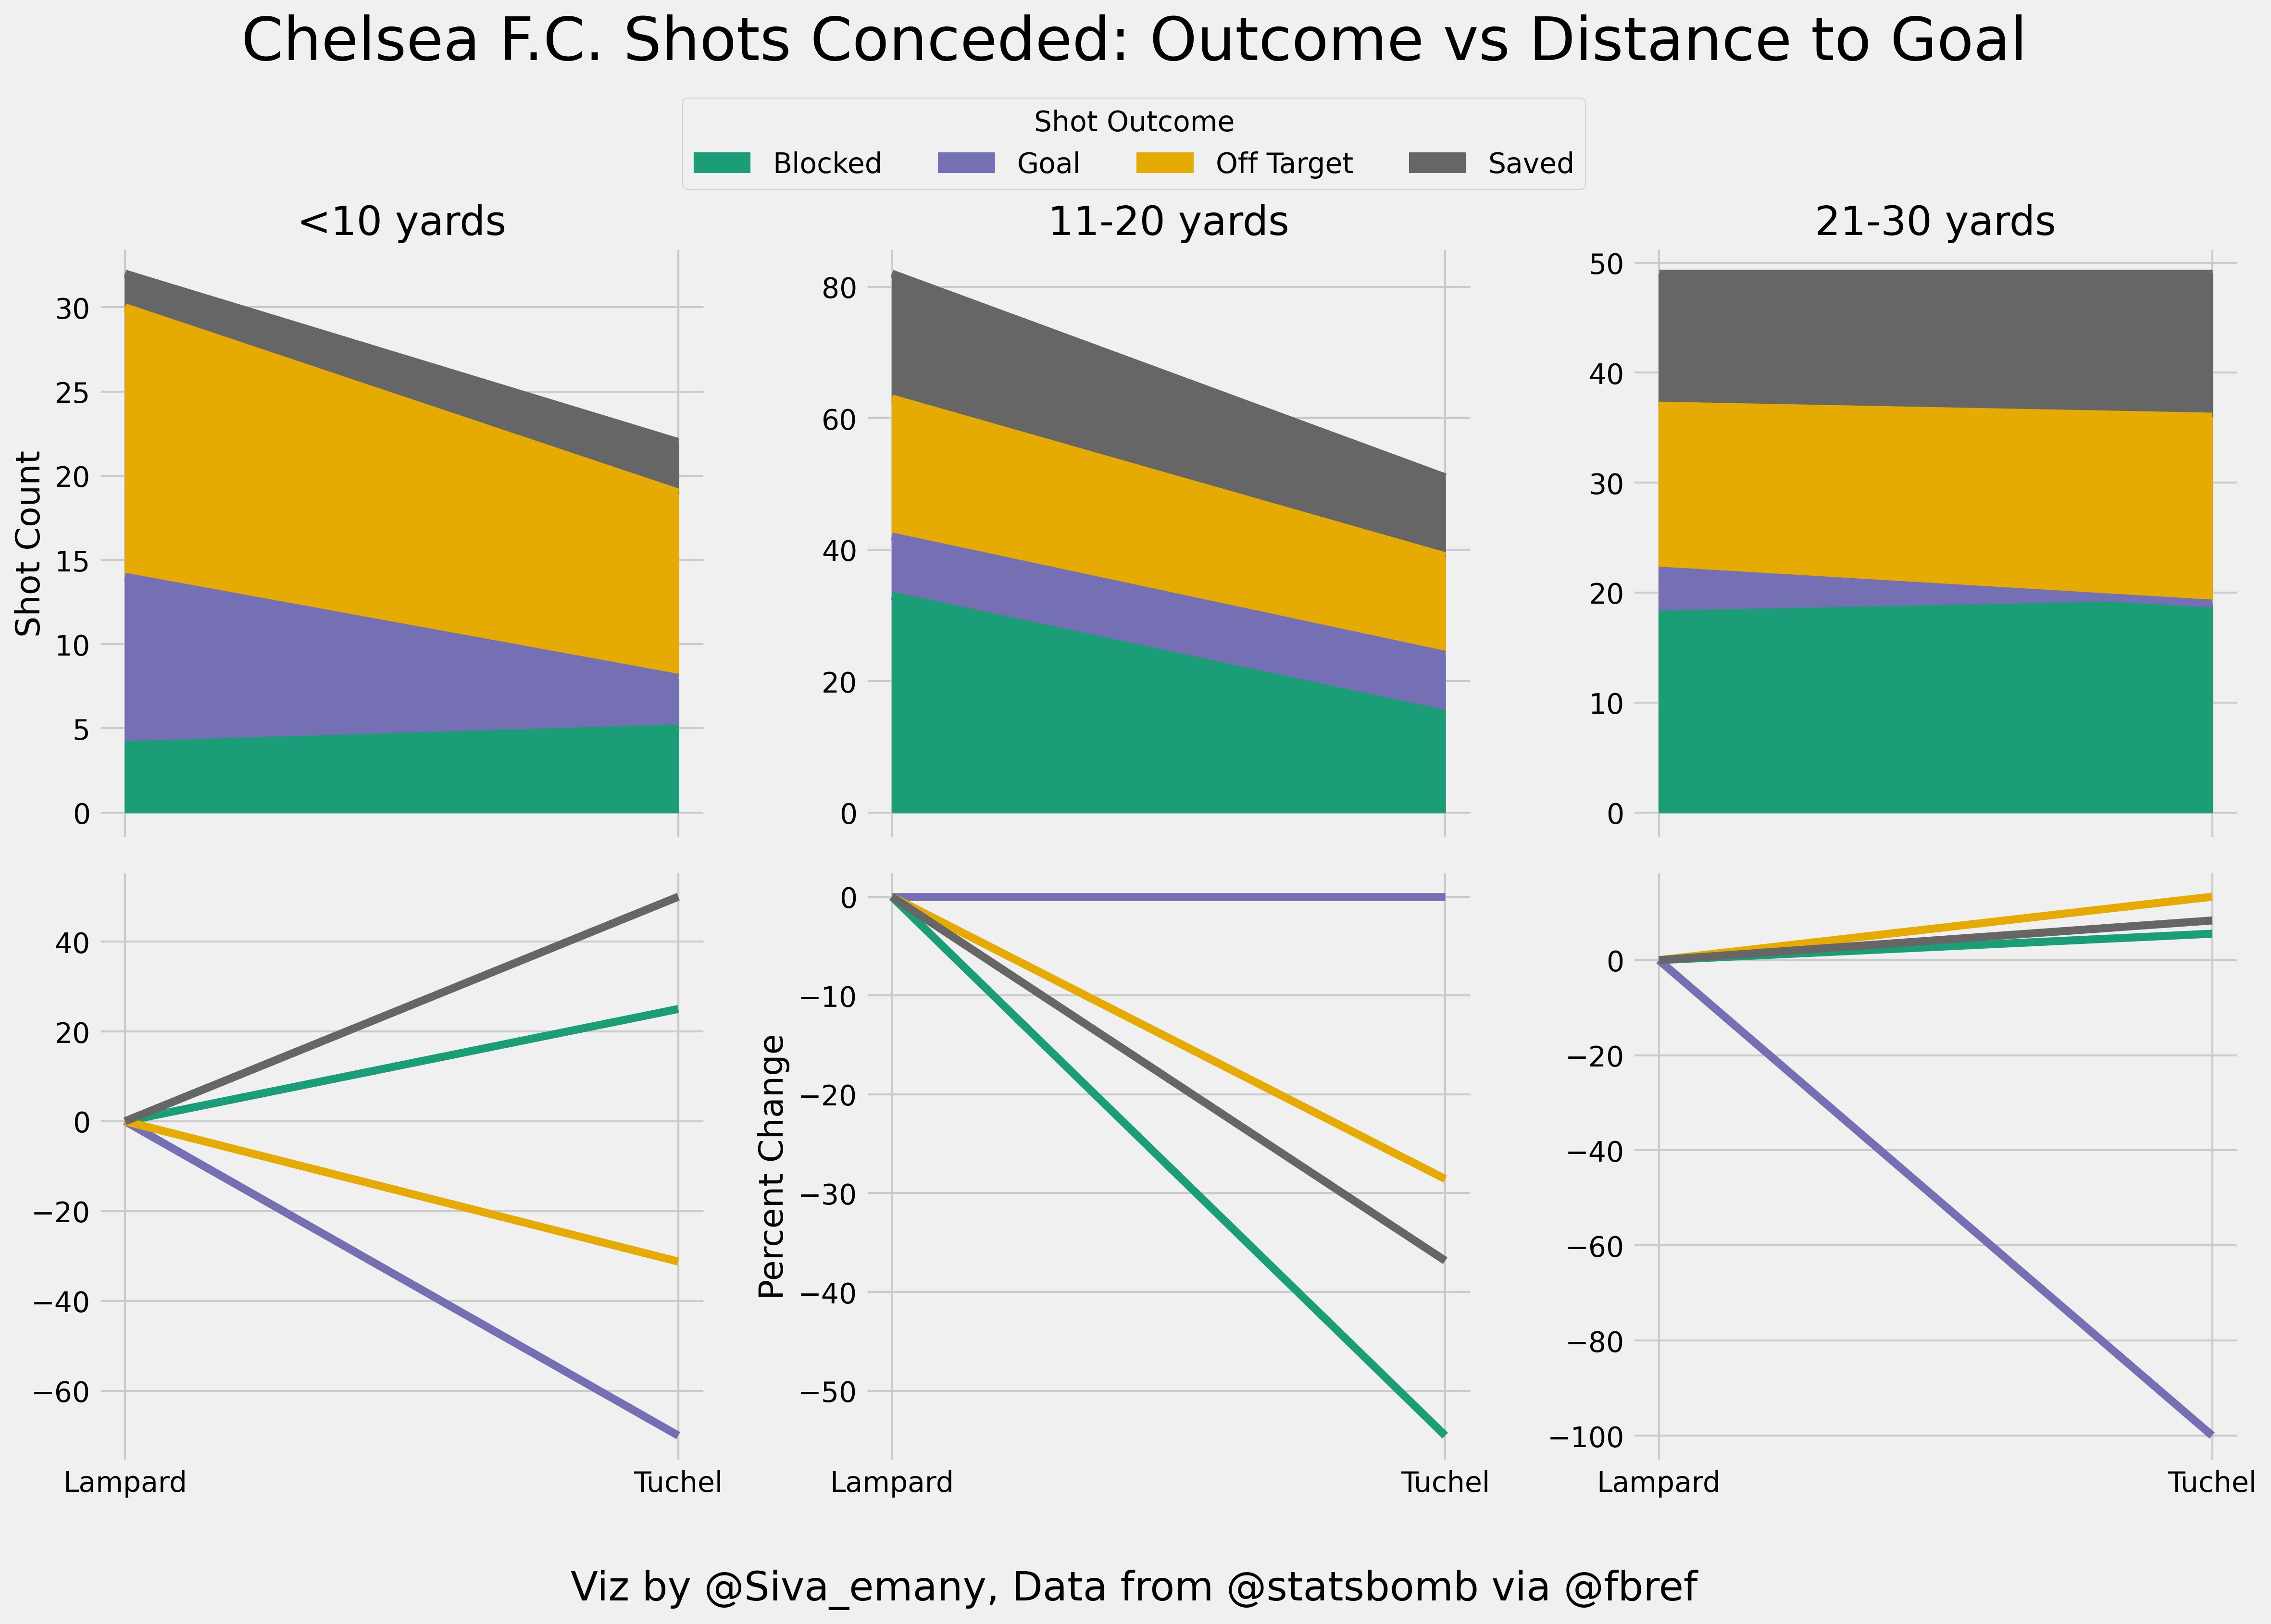 Defensive improvement under Tuchel